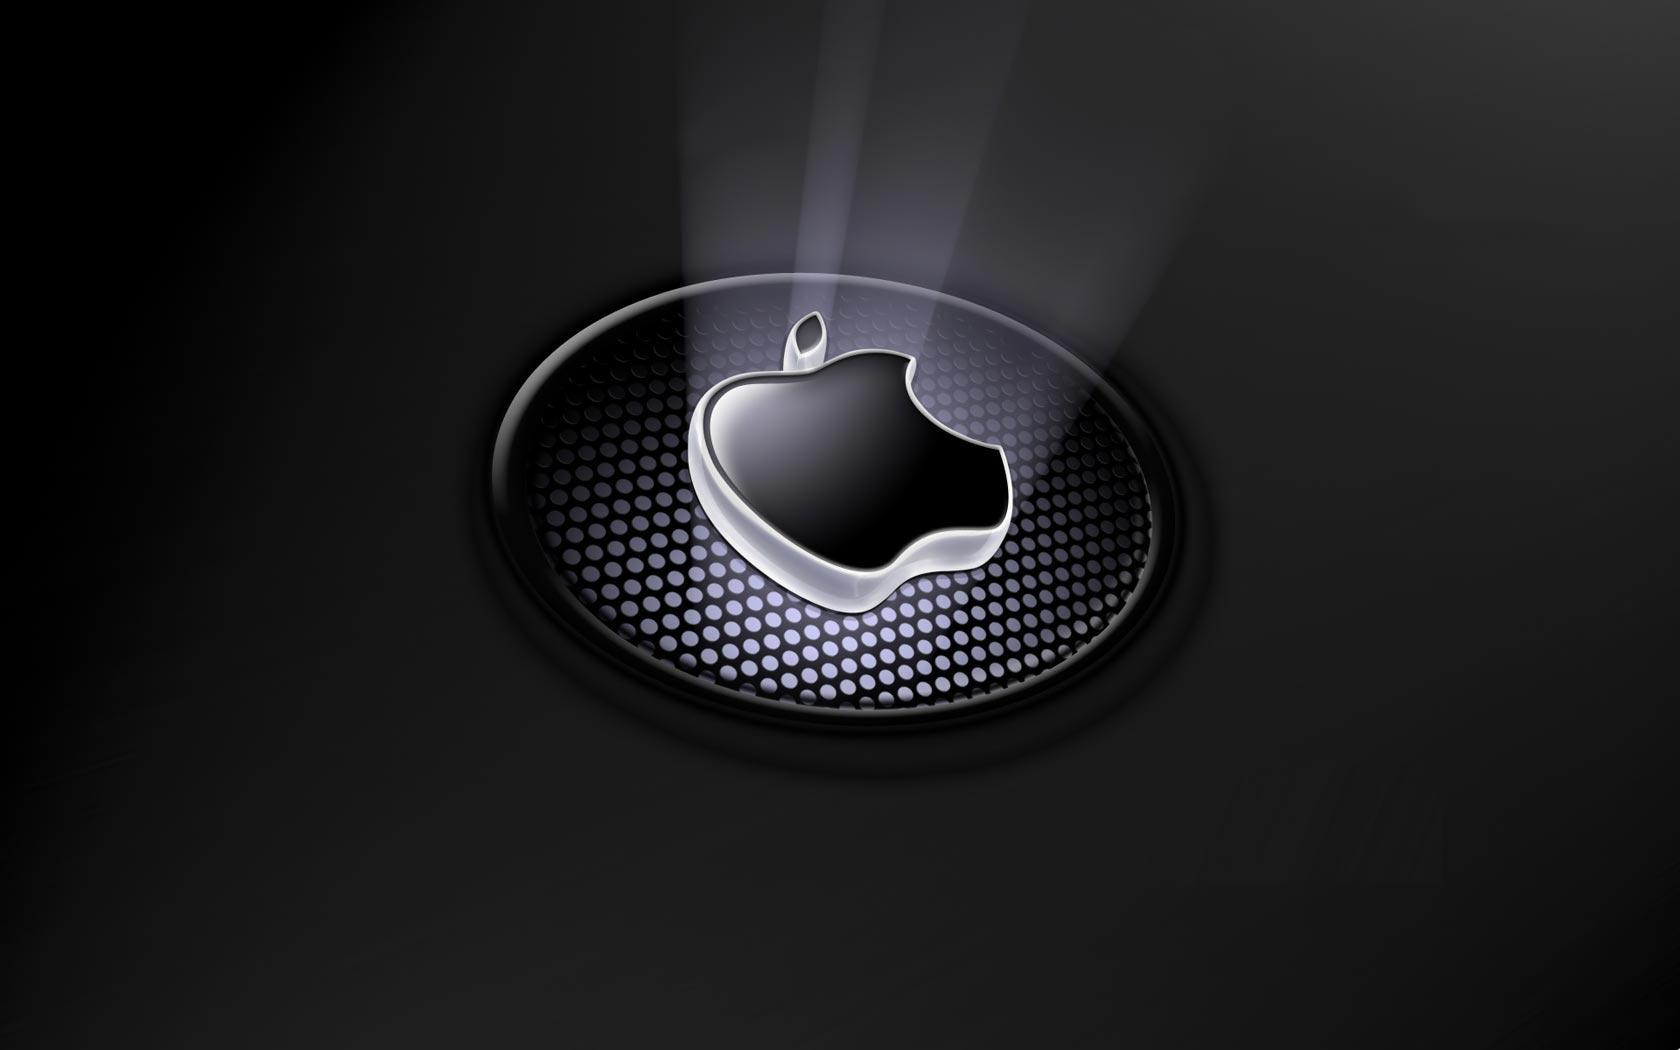 Apple Wallpaper HD 1080p